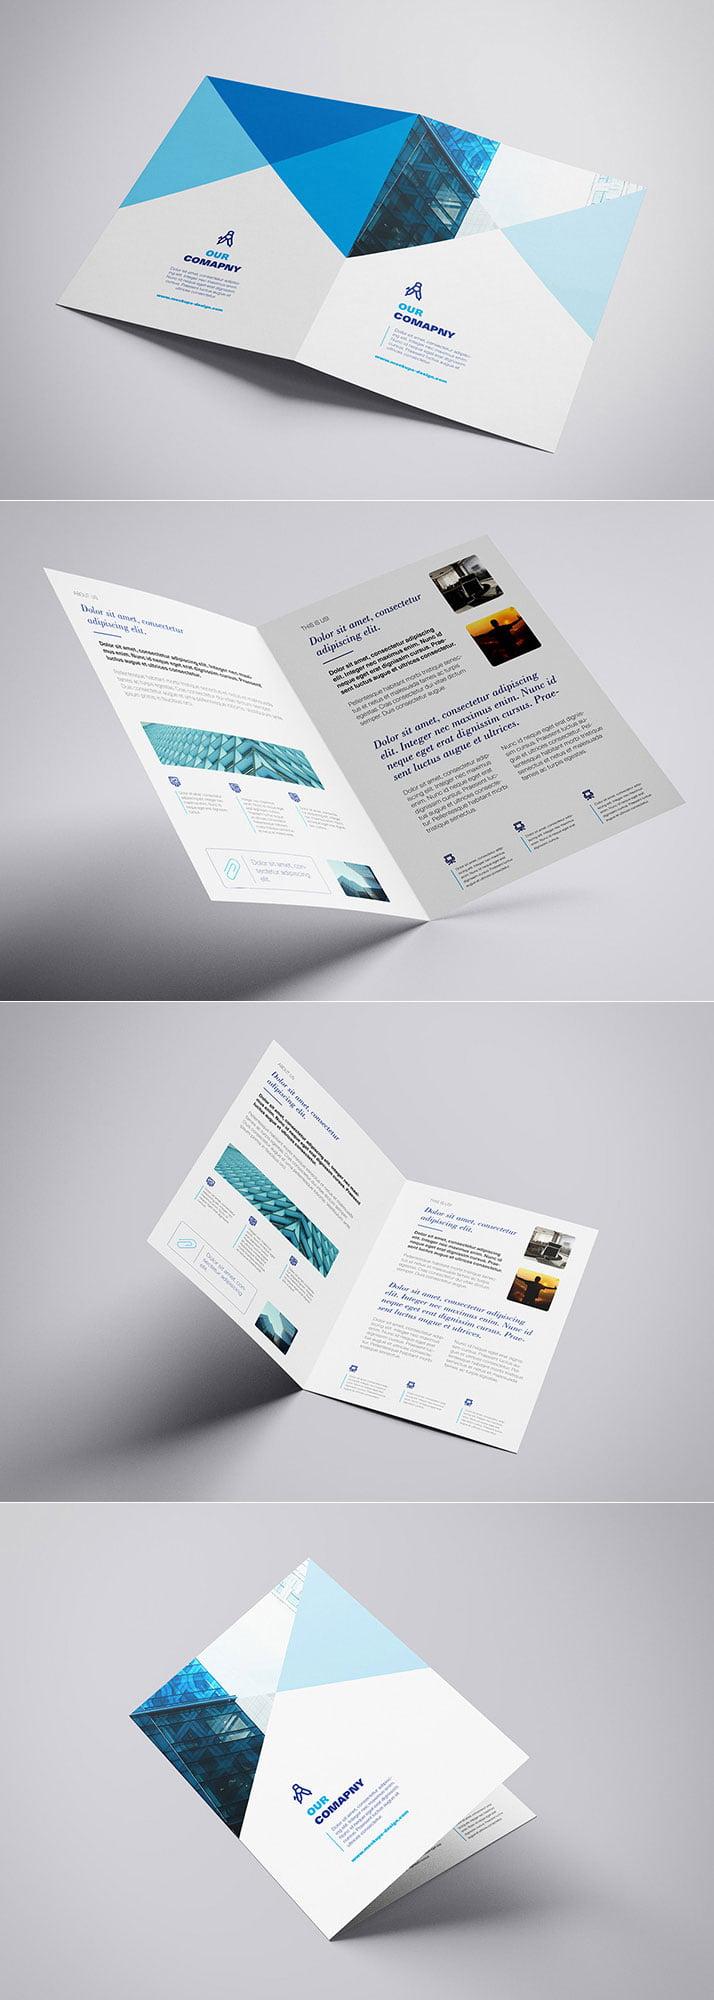 Free A4 Bifold Brochure Mockup PSD